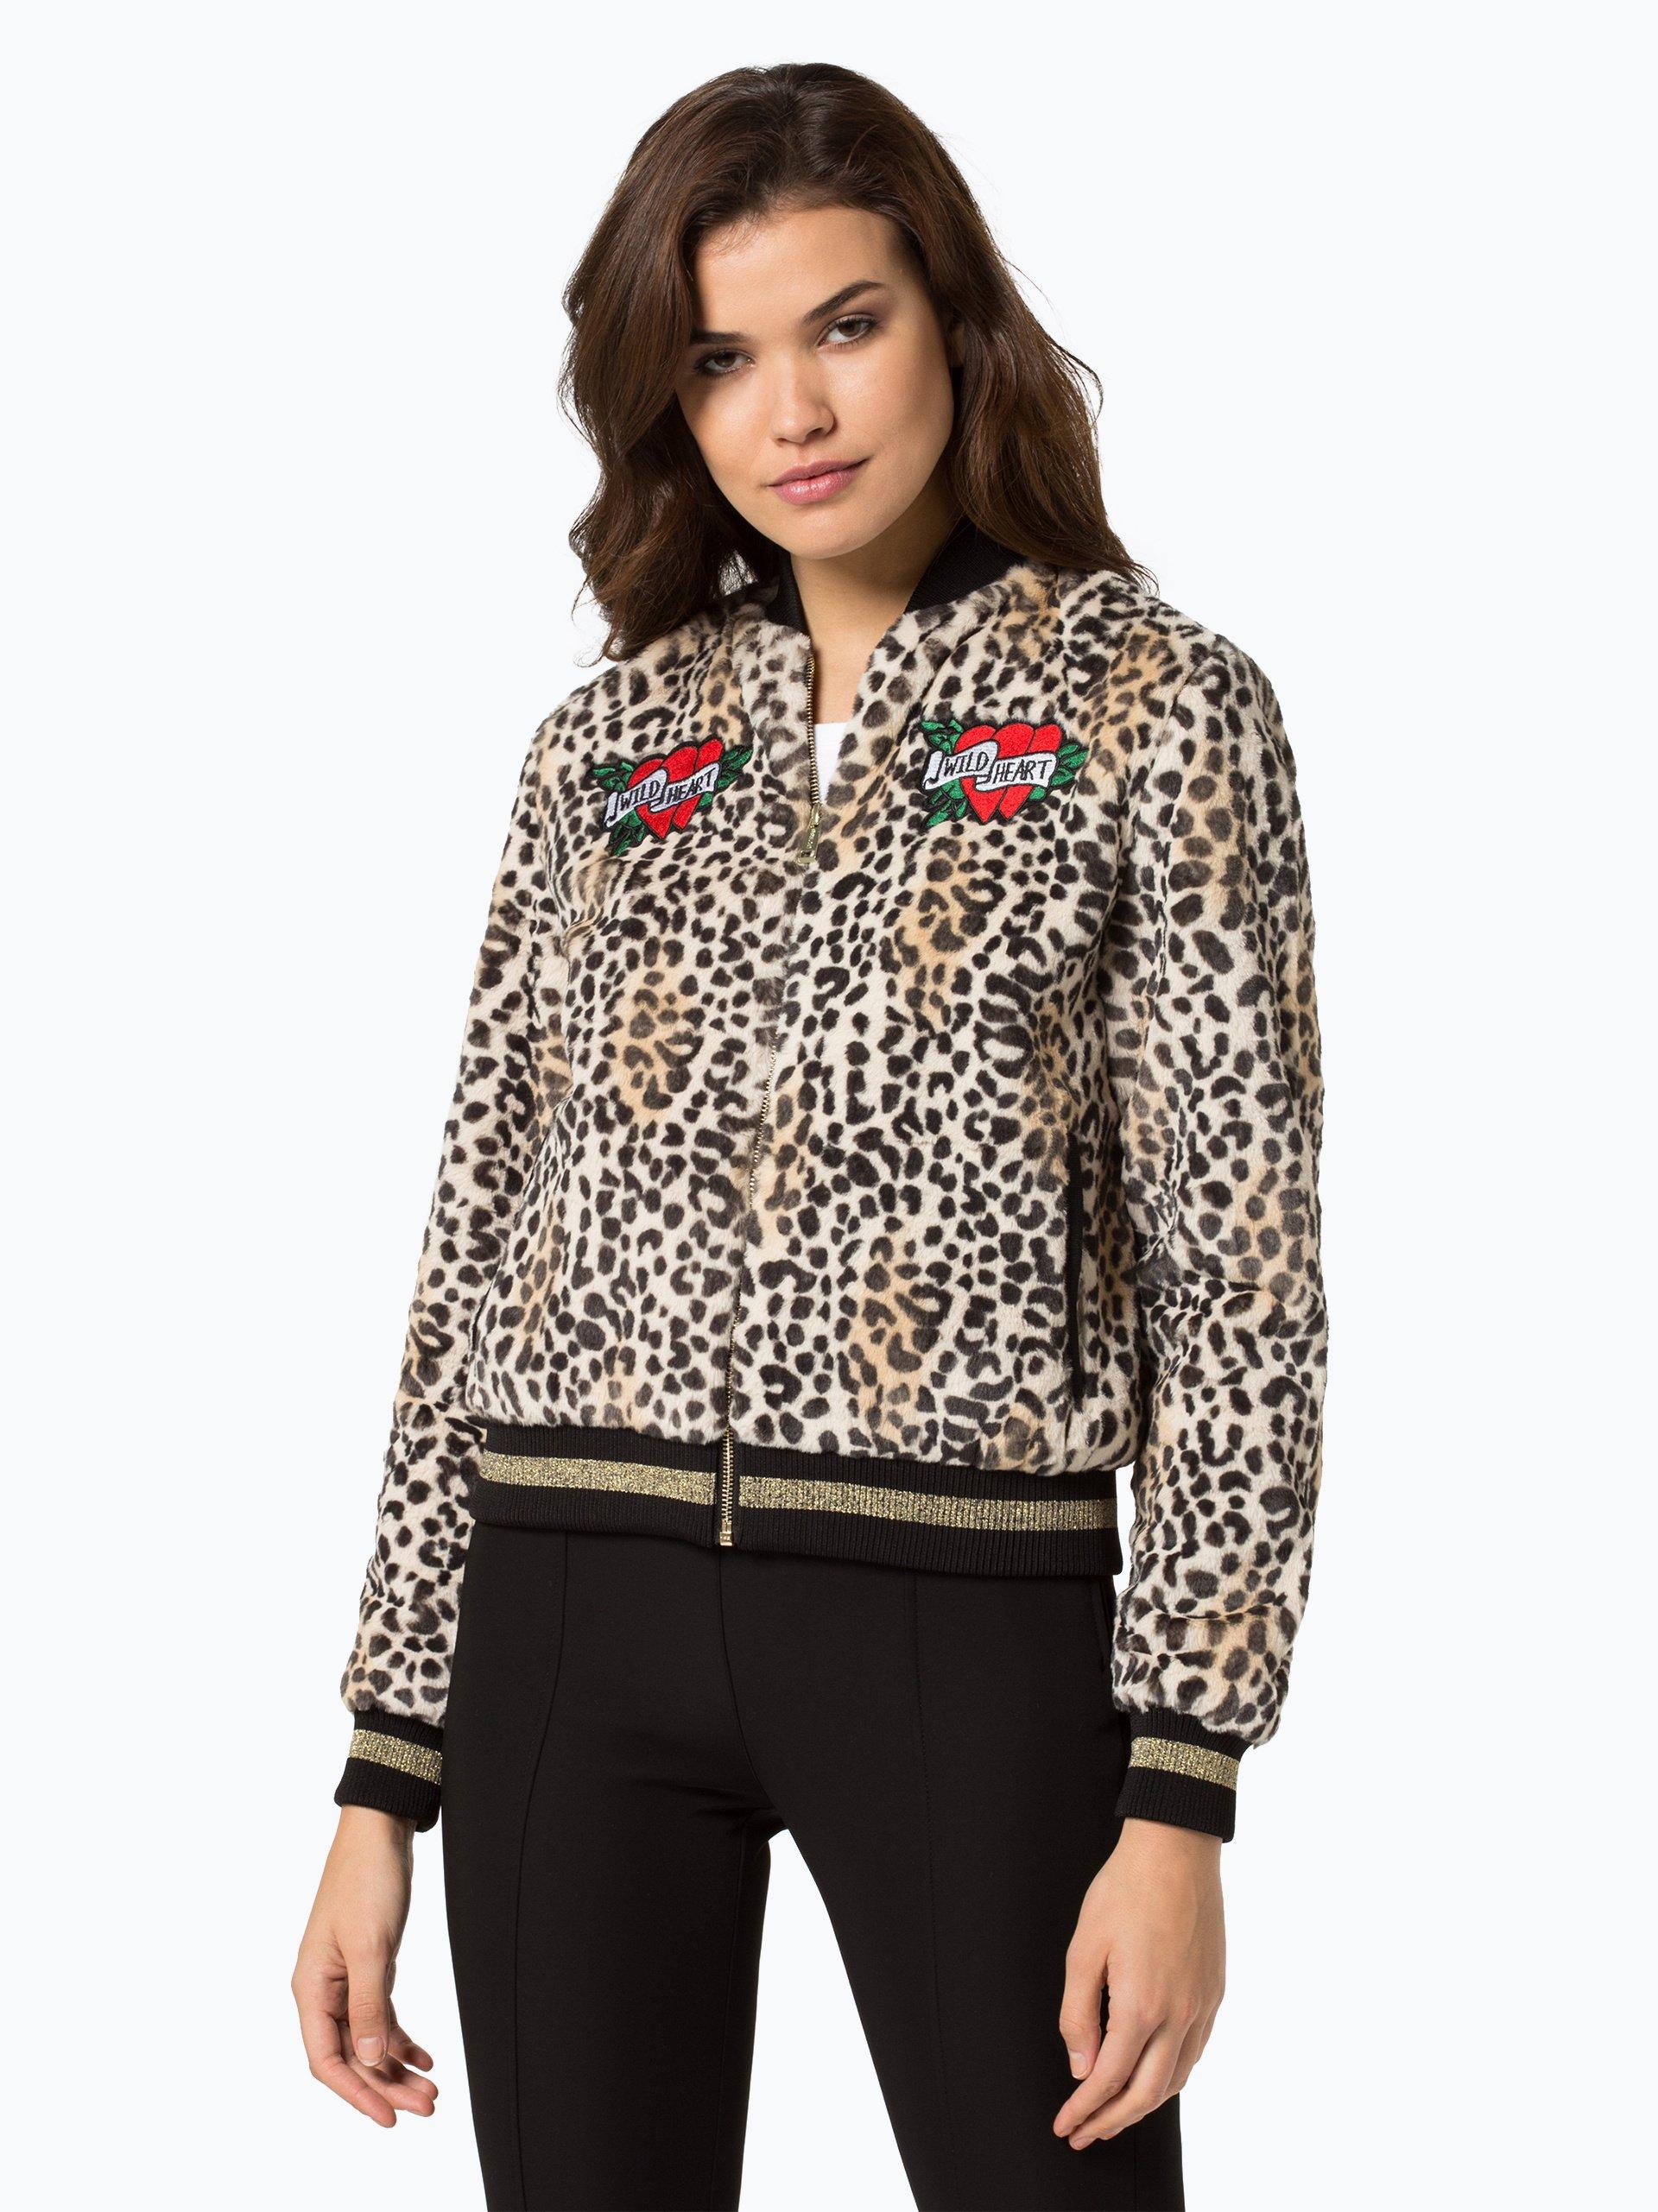 guess jeans damen jacke beige gemustert online kaufen vangraaf com. Black Bedroom Furniture Sets. Home Design Ideas